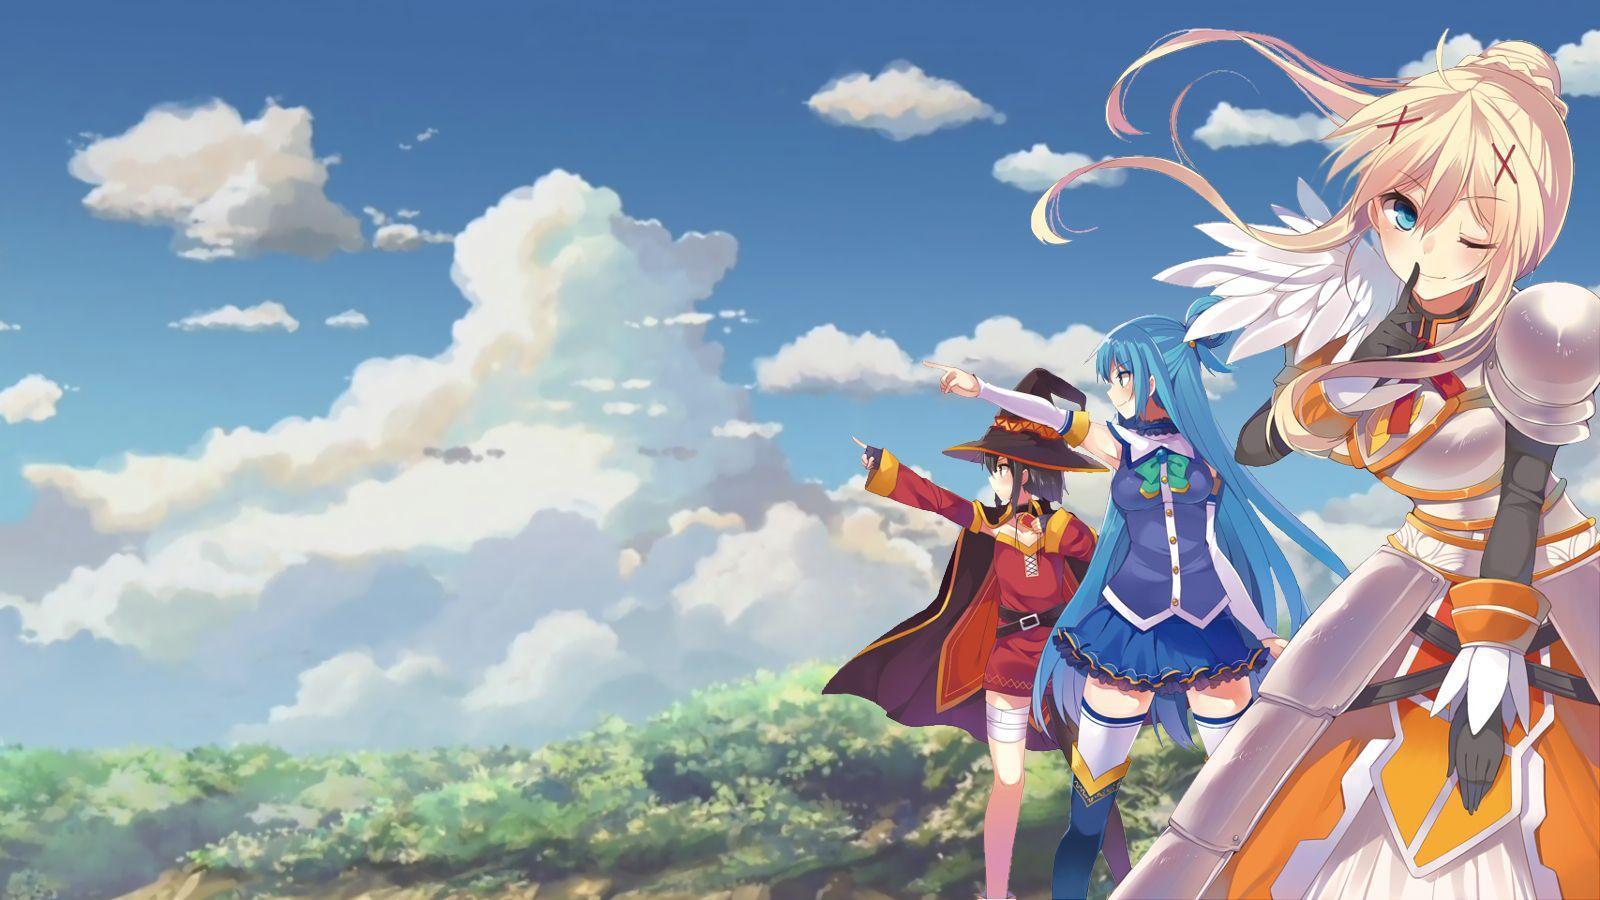 900 Wallpaper Anime Konosuba Hd HD Paling Baru